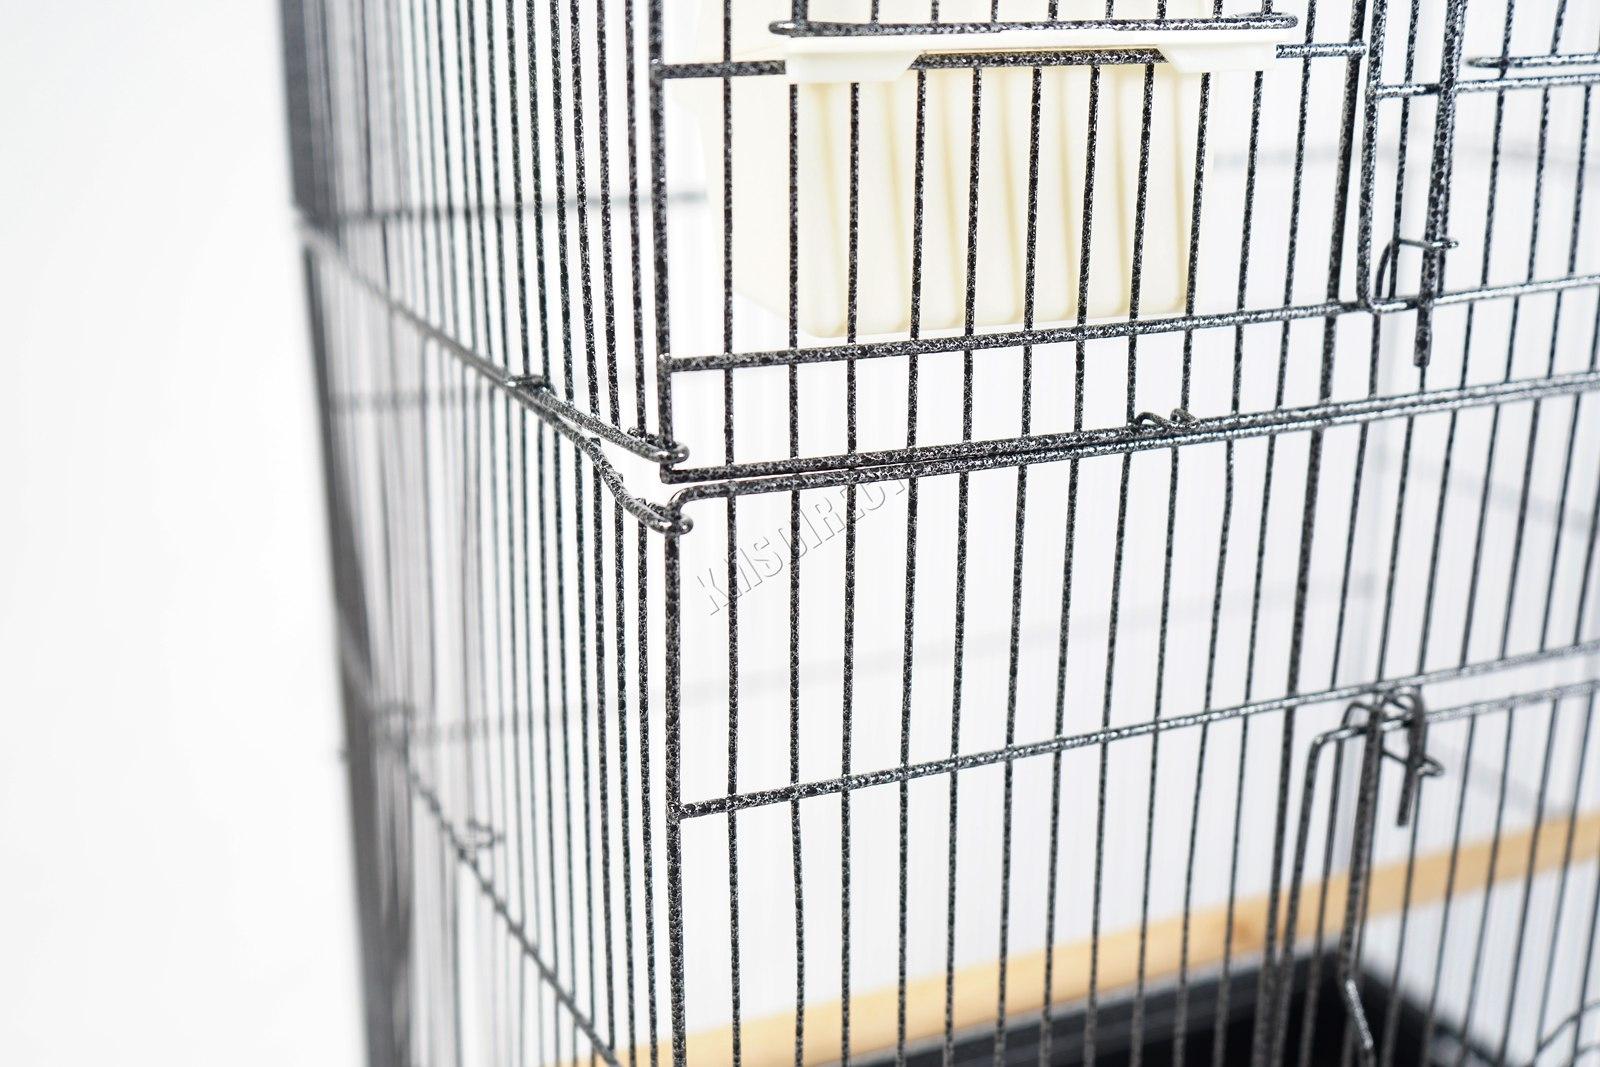 BIRD CAGE METAL MBC 05 HAMMERED SILVER KMSWM10 - Foxhunter Grande Metal Jaula con Soporte Pajarera Loro Periquito Canario Cacatua